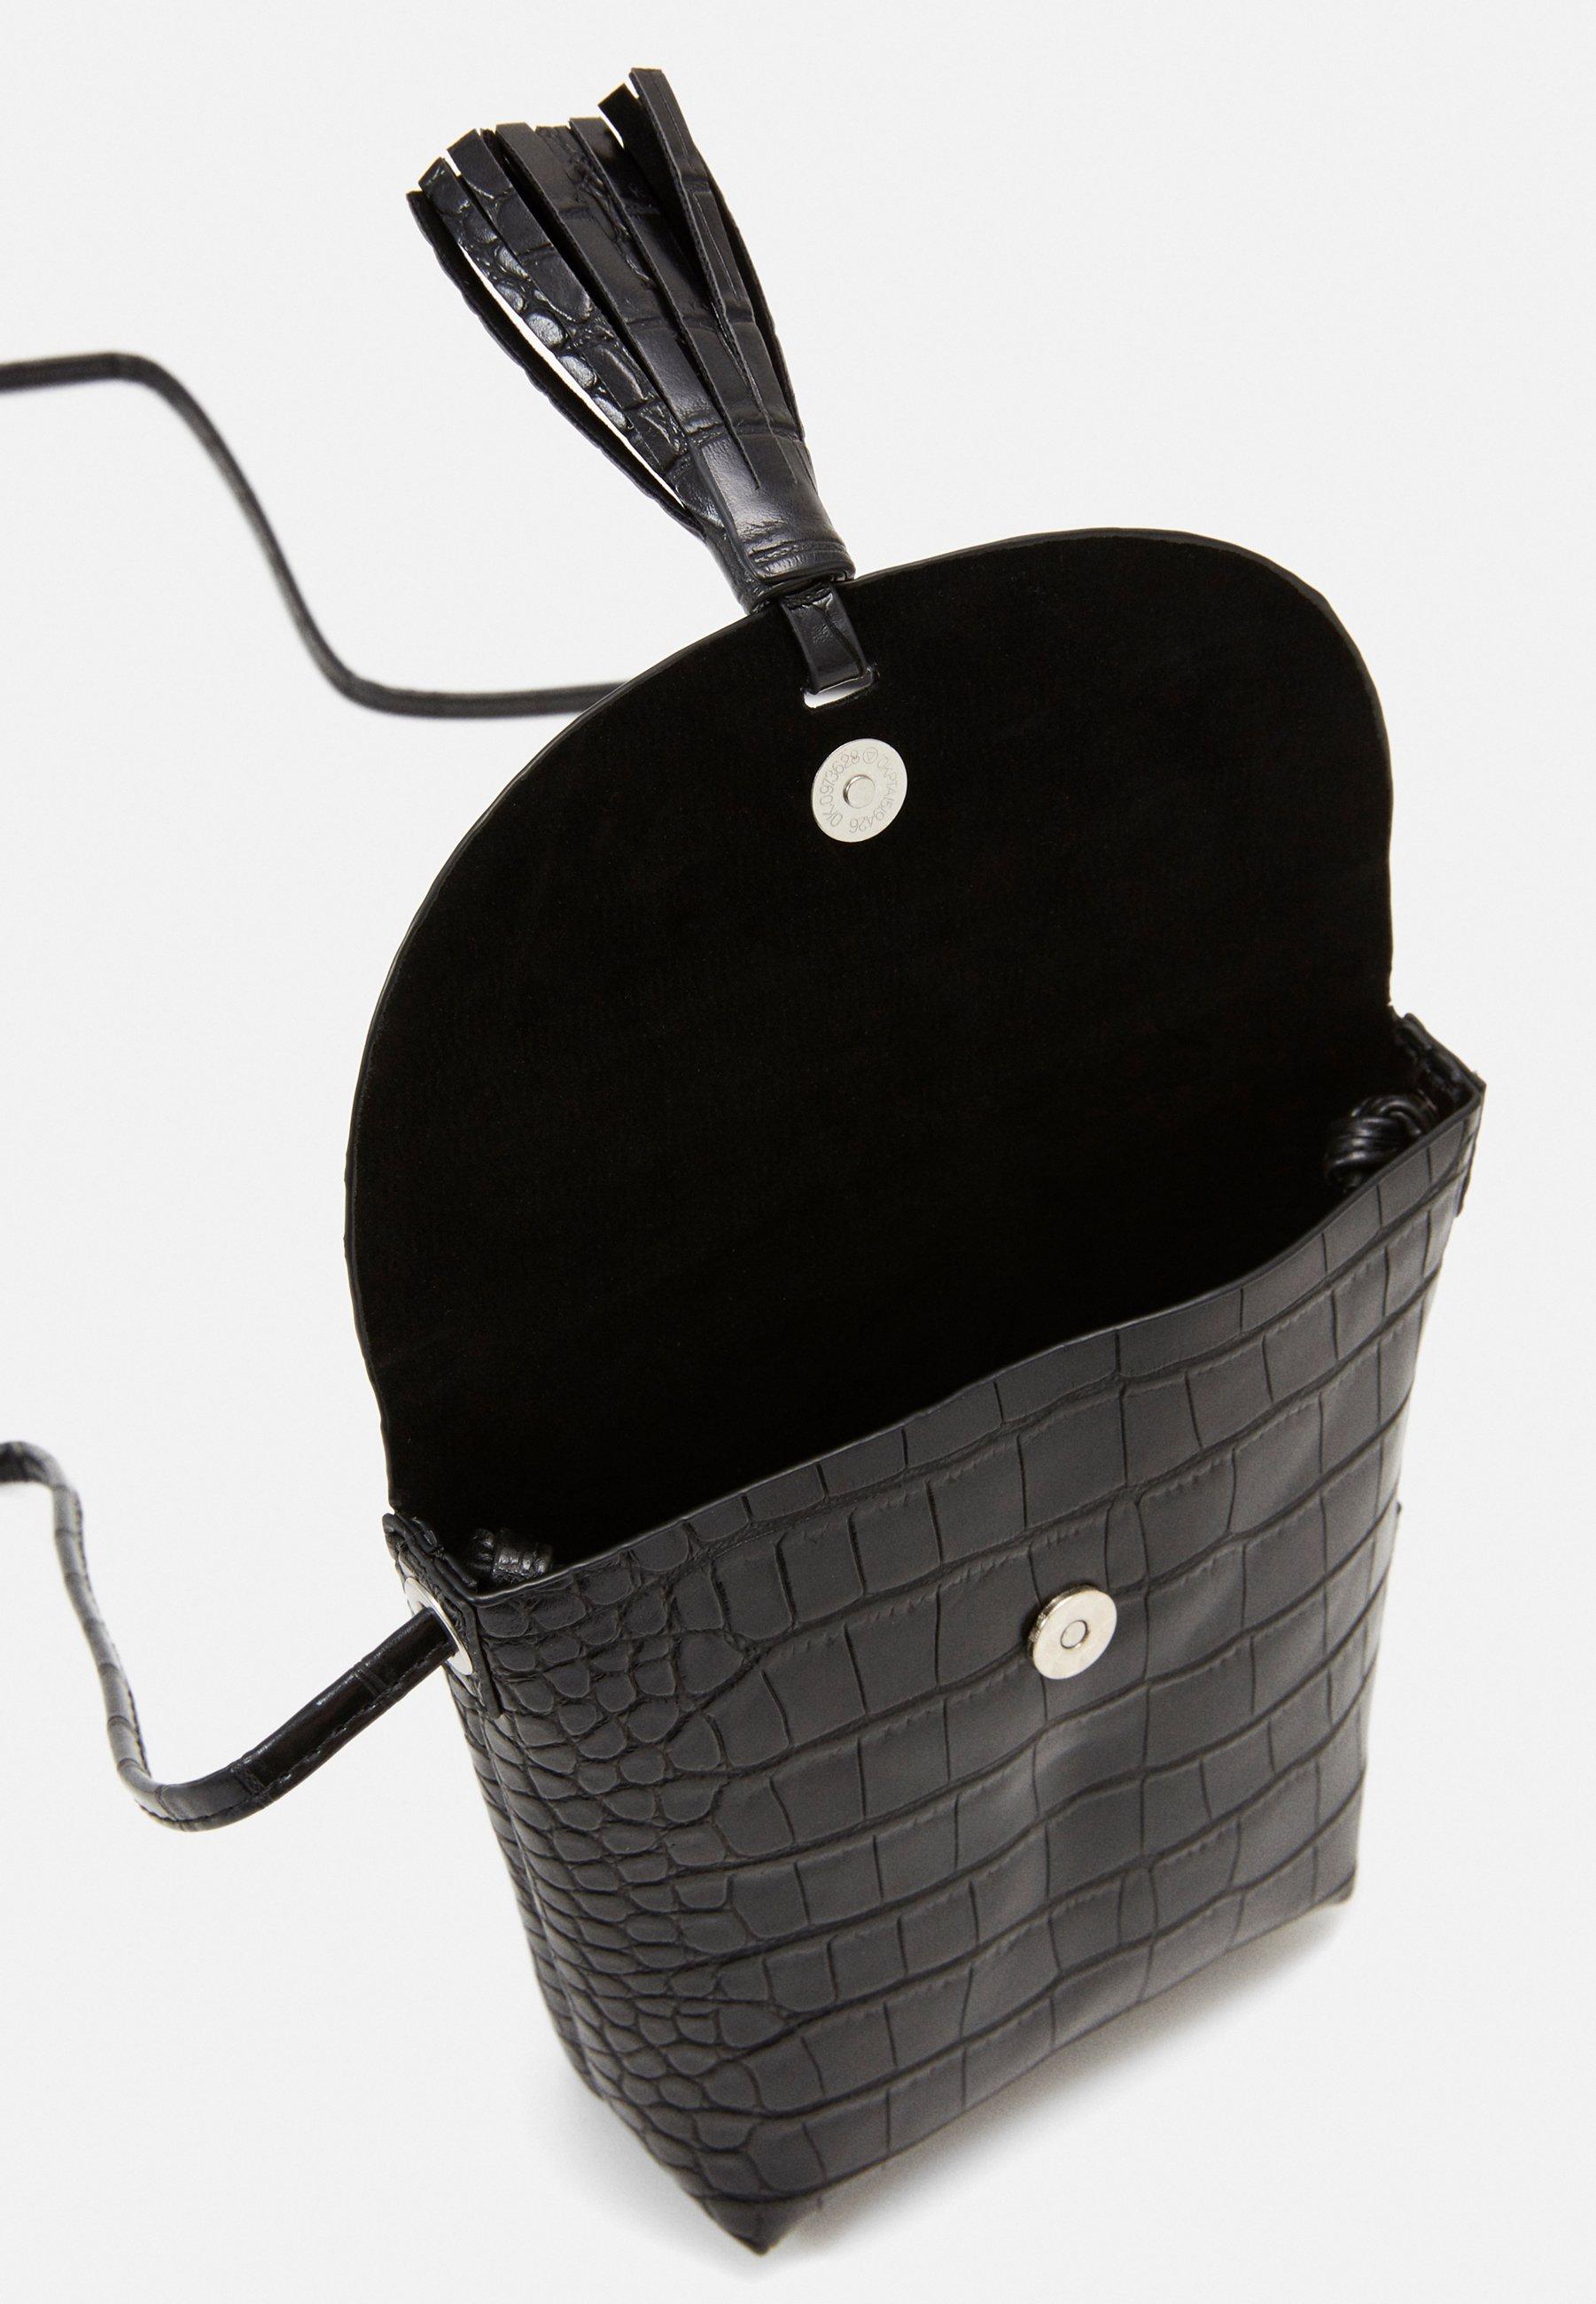 TOM TAILOR DENIM IDA CROC - Skulderveske - black/svart c4wSZLsYlQ3VGNJ